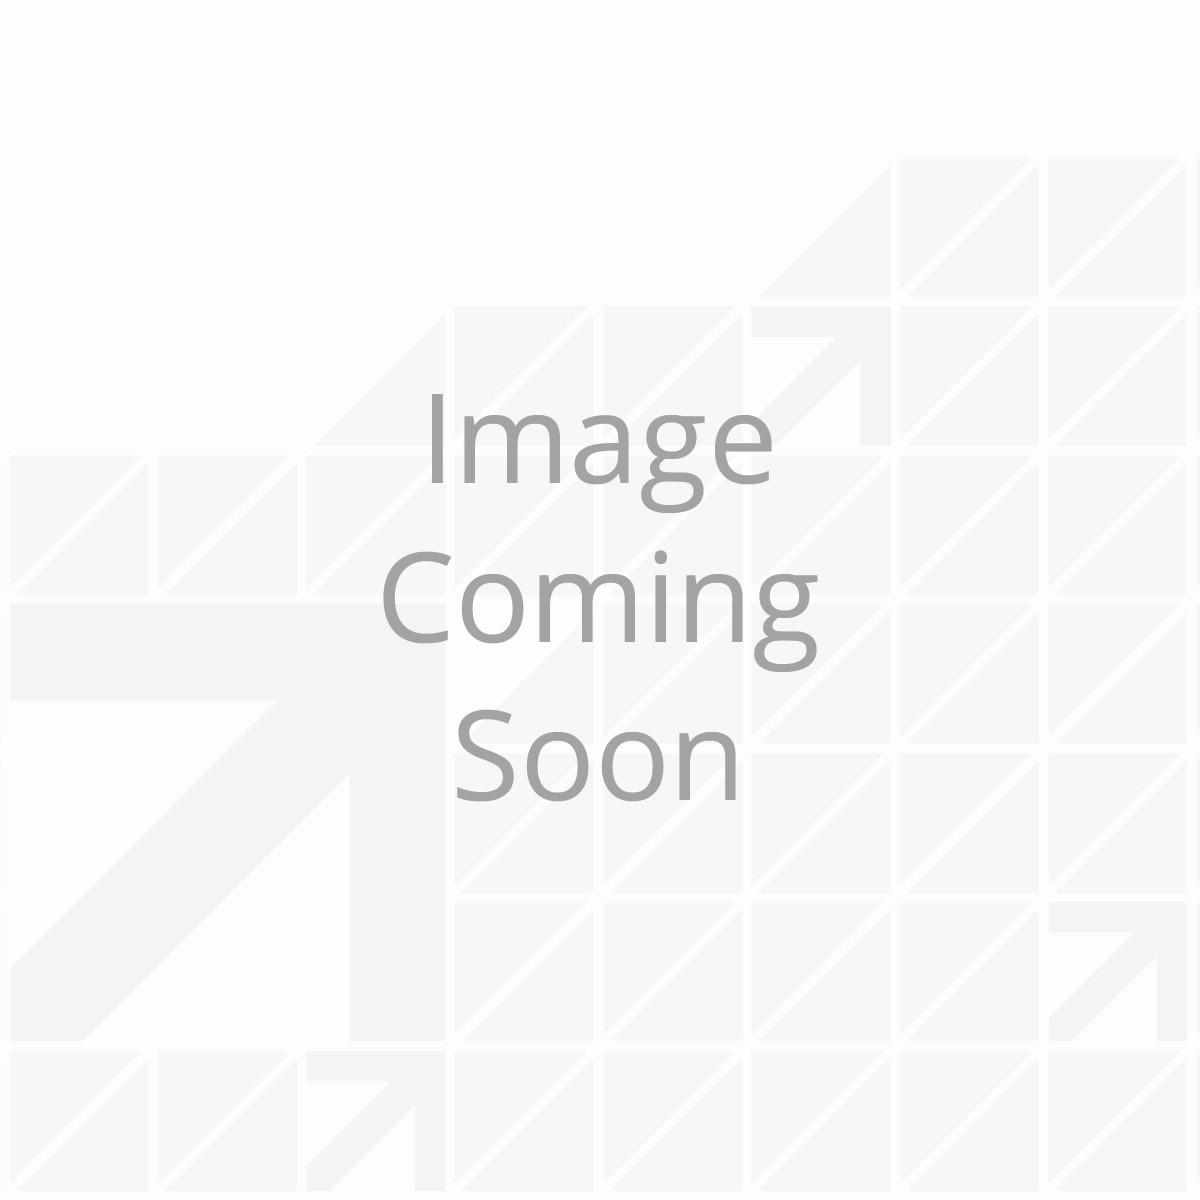 36 Bench Seat651d2b4a92f6cbd8e336404f529a7b3c796a27ac 2 Jpg